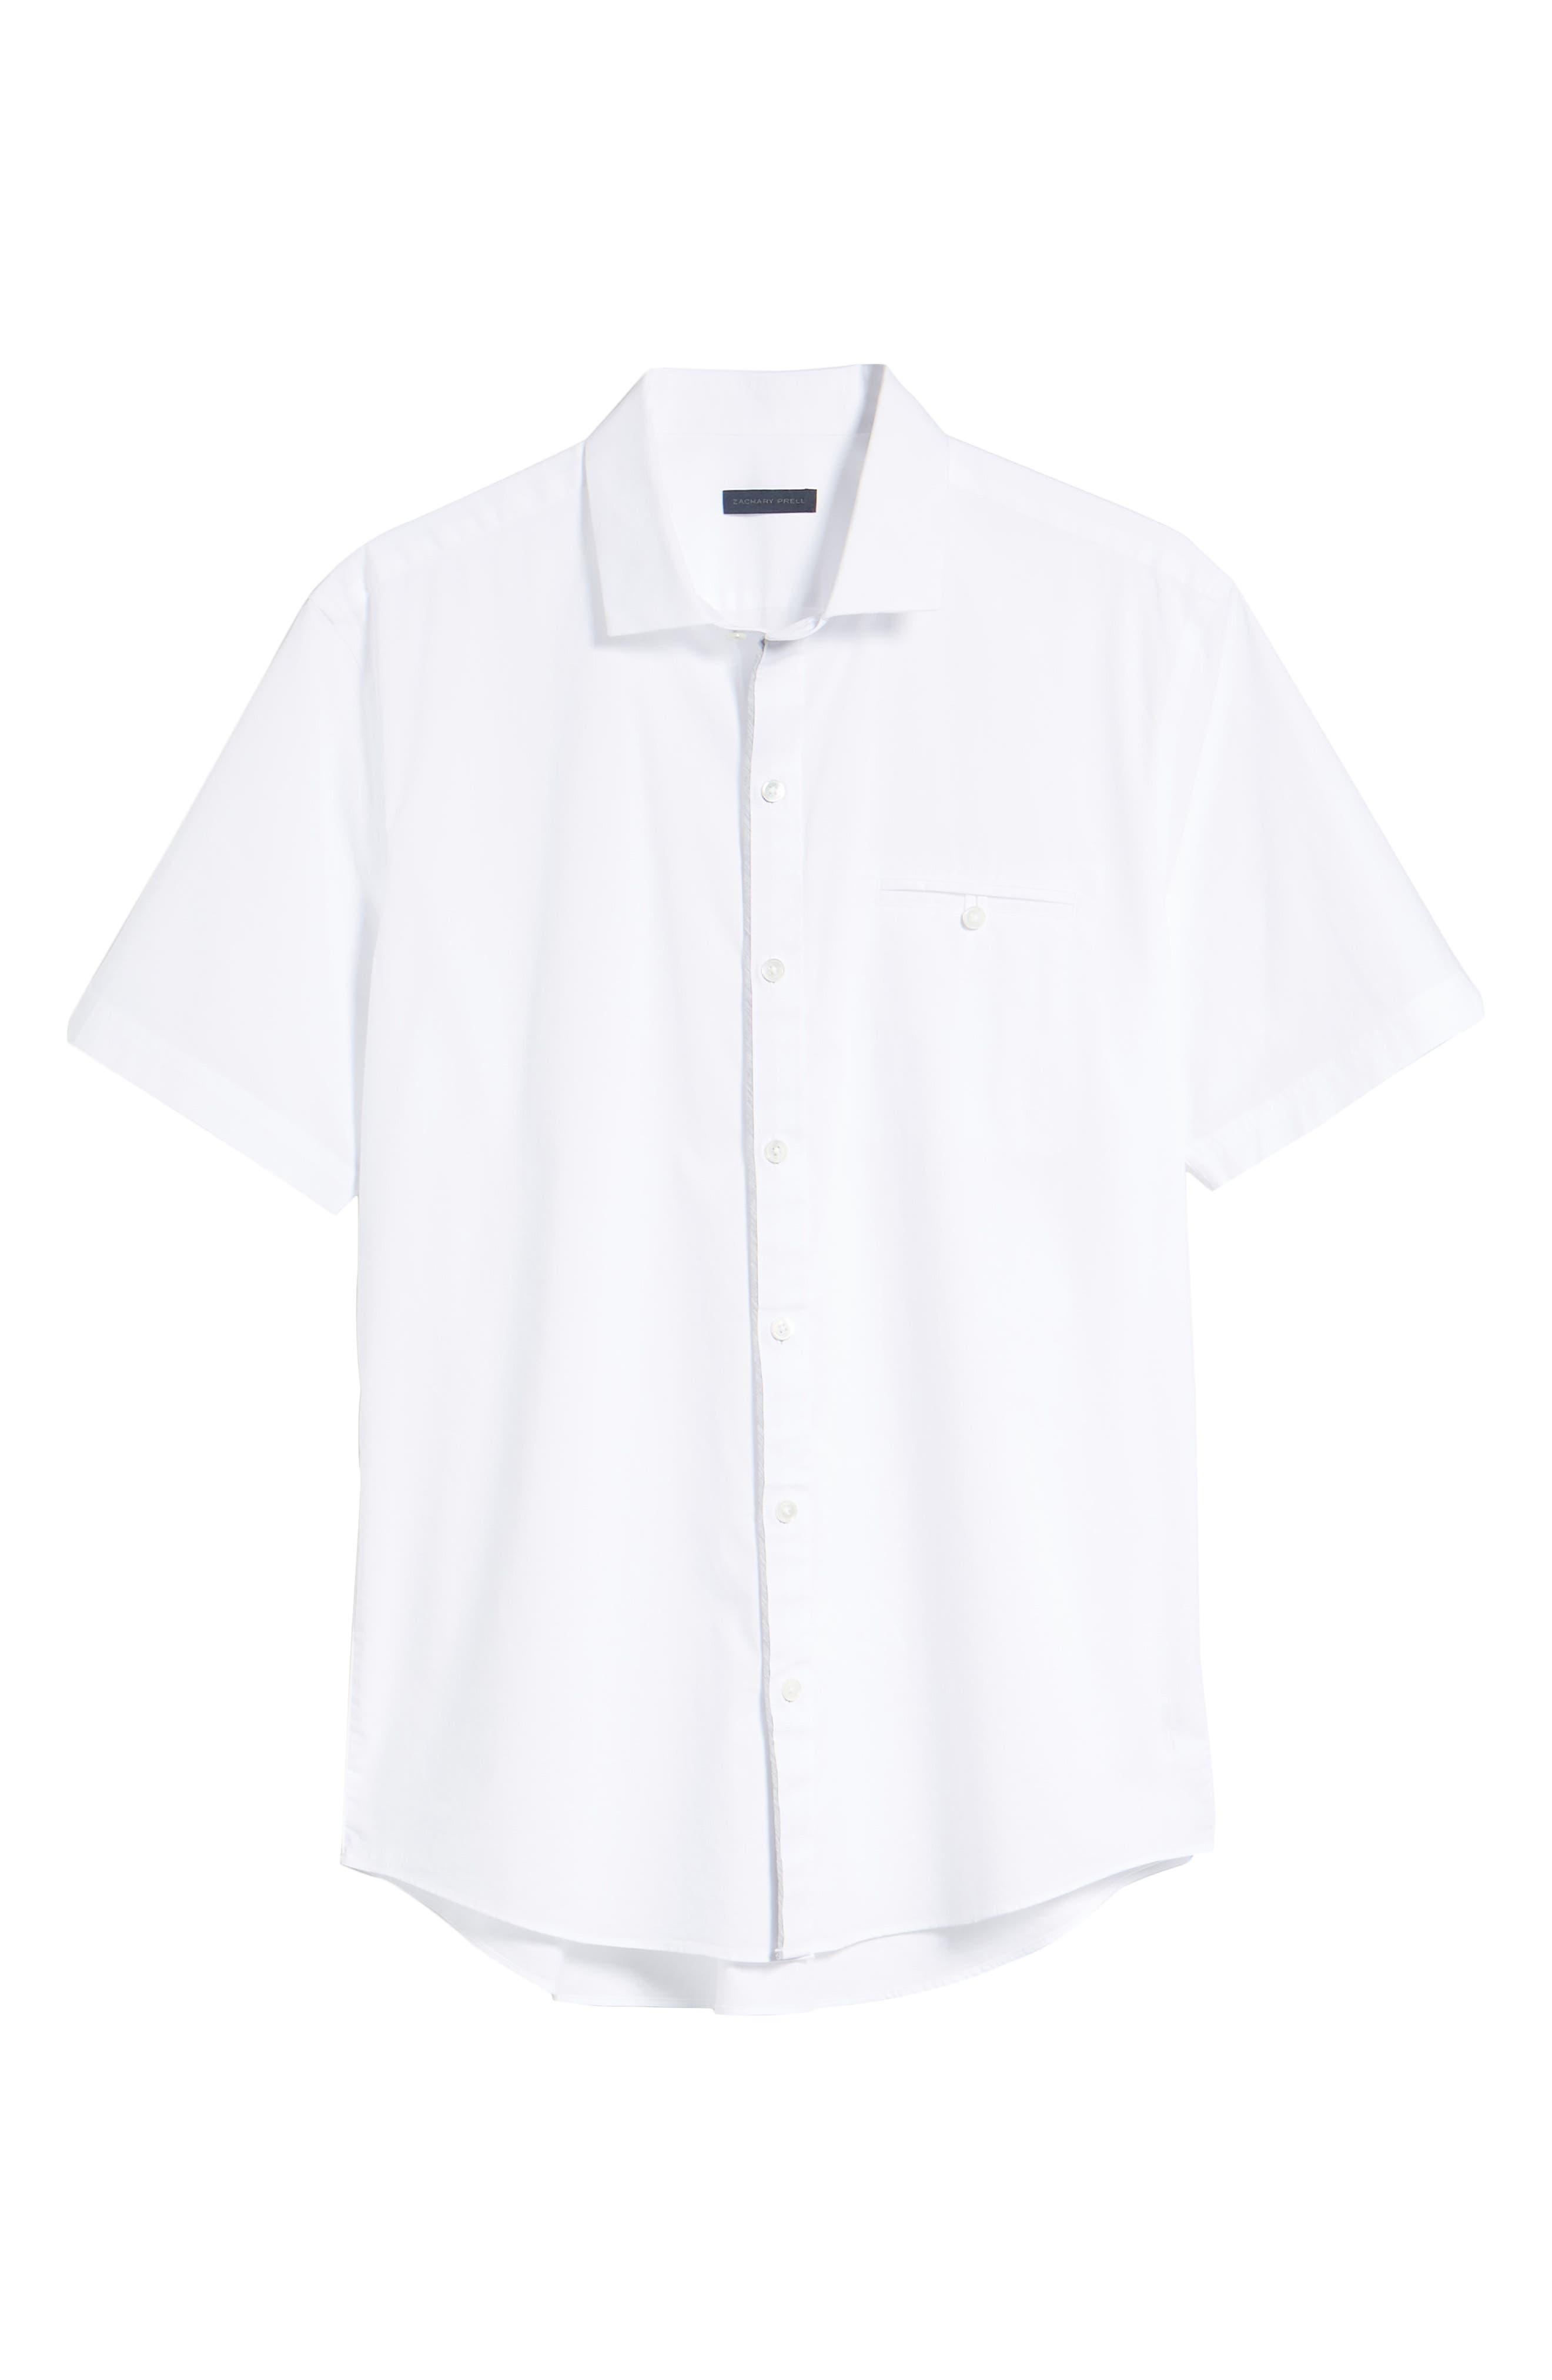 Baumann Slim Fit Sport Shirt,                             Alternate thumbnail 6, color,                             100